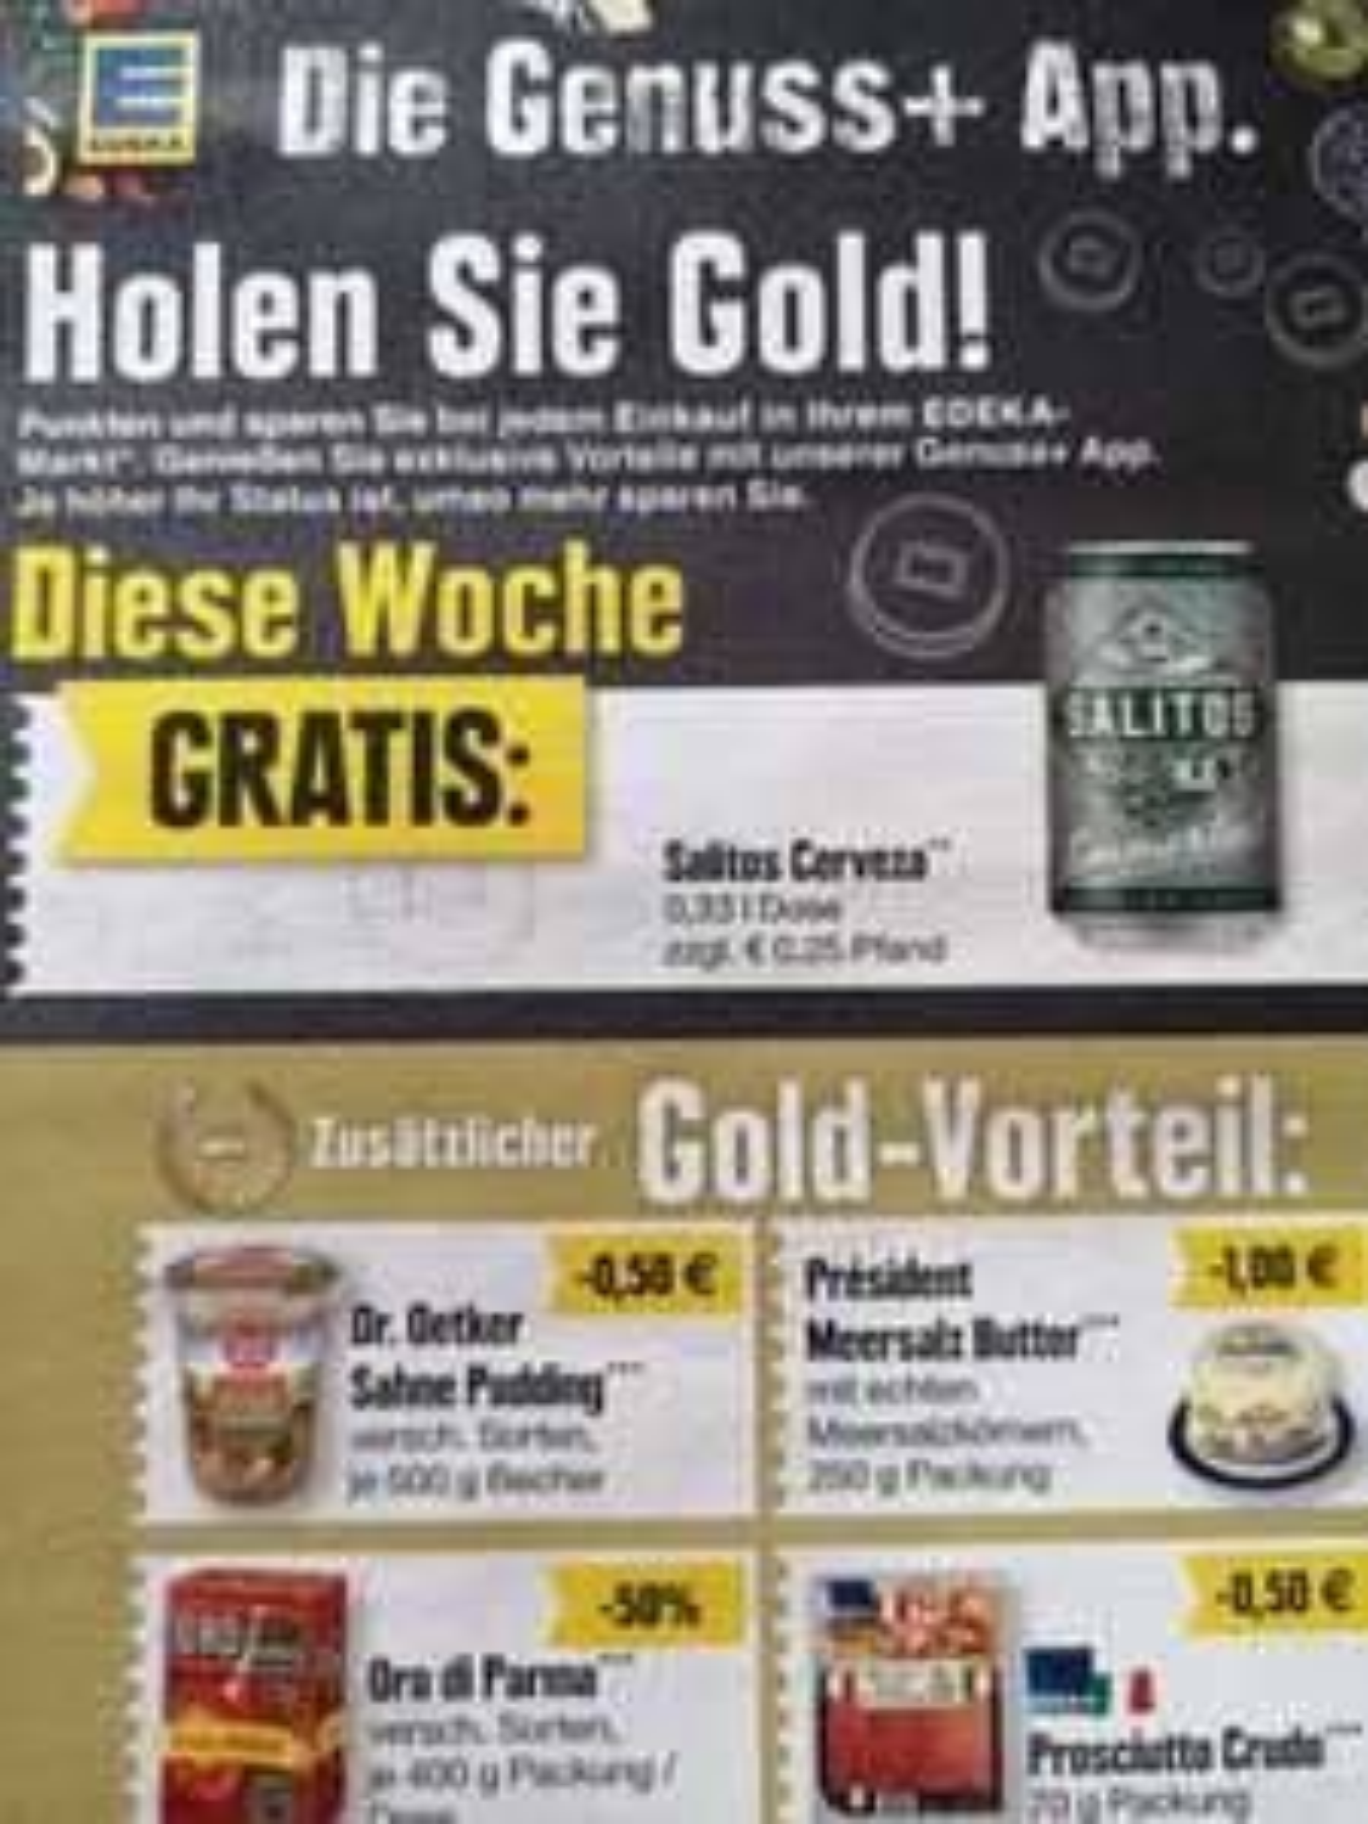 (Edeka Rhein-Ruhr / Edeka Genuss+ App) 1 Dose 0,33 Salitos Cerveza